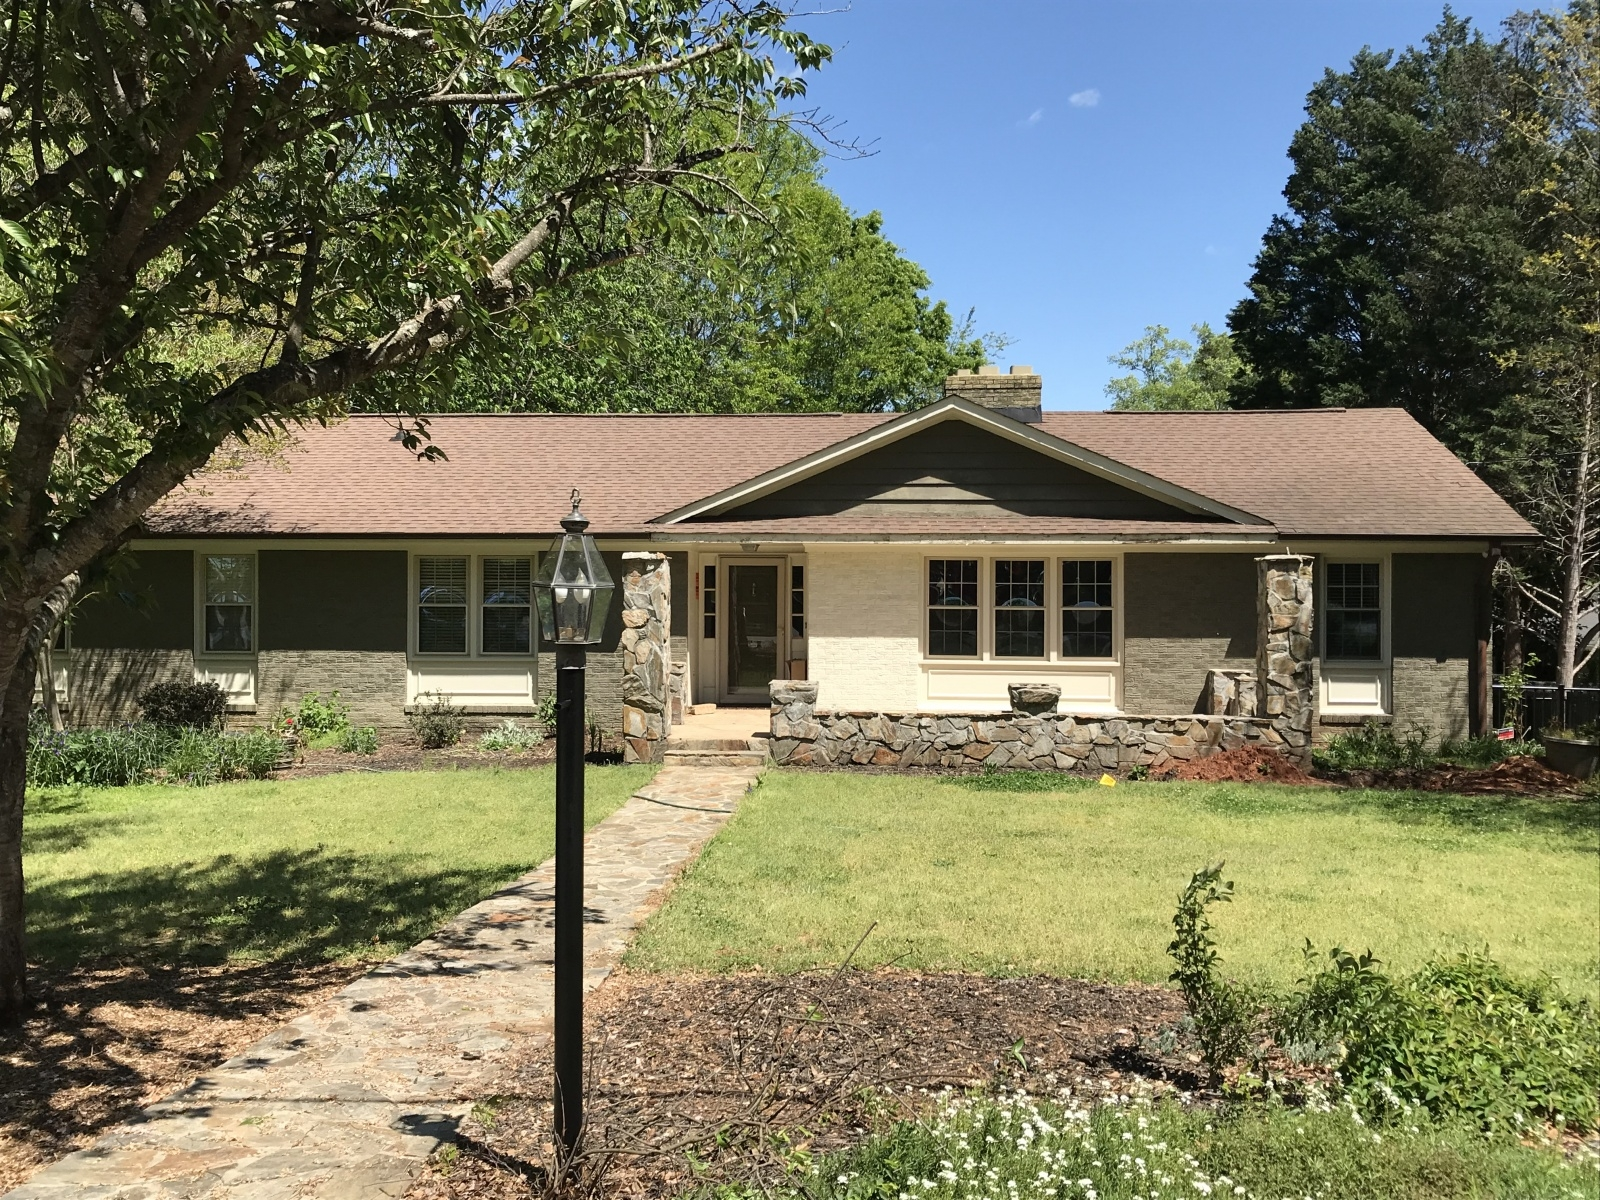 33-sa-front-porch-addition-5